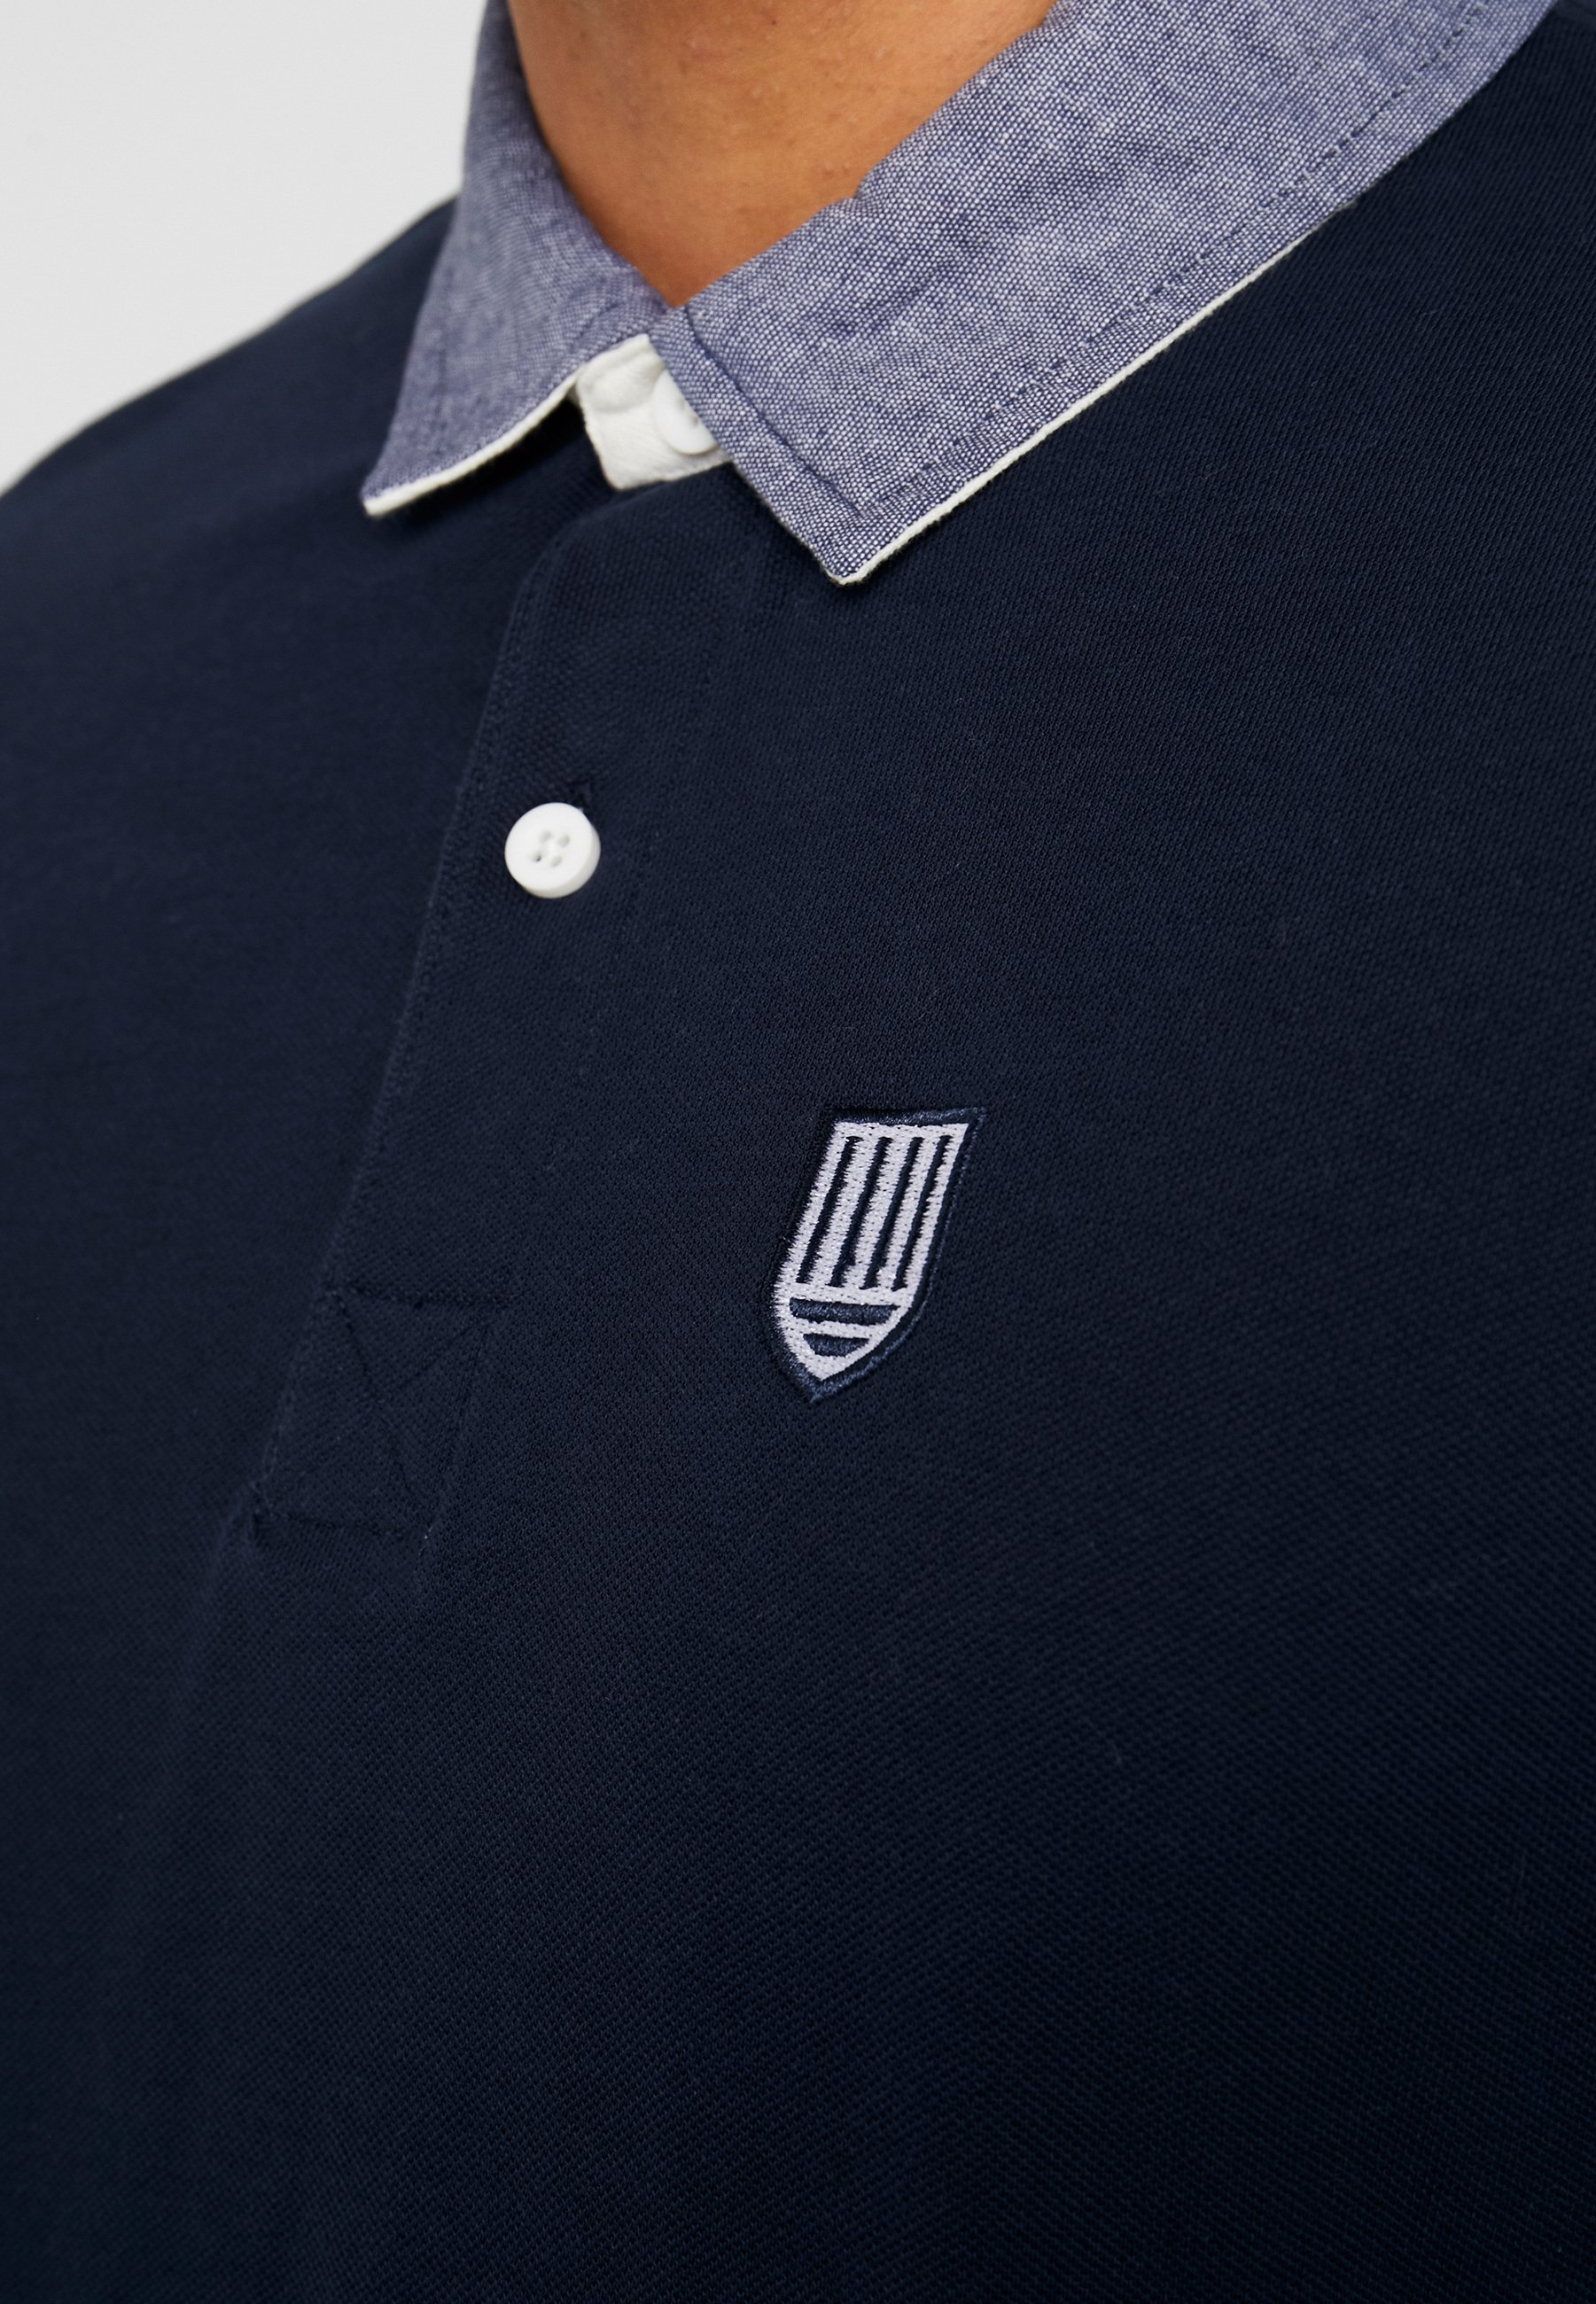 Pier One Polo shirt - dark blue 0Vz12